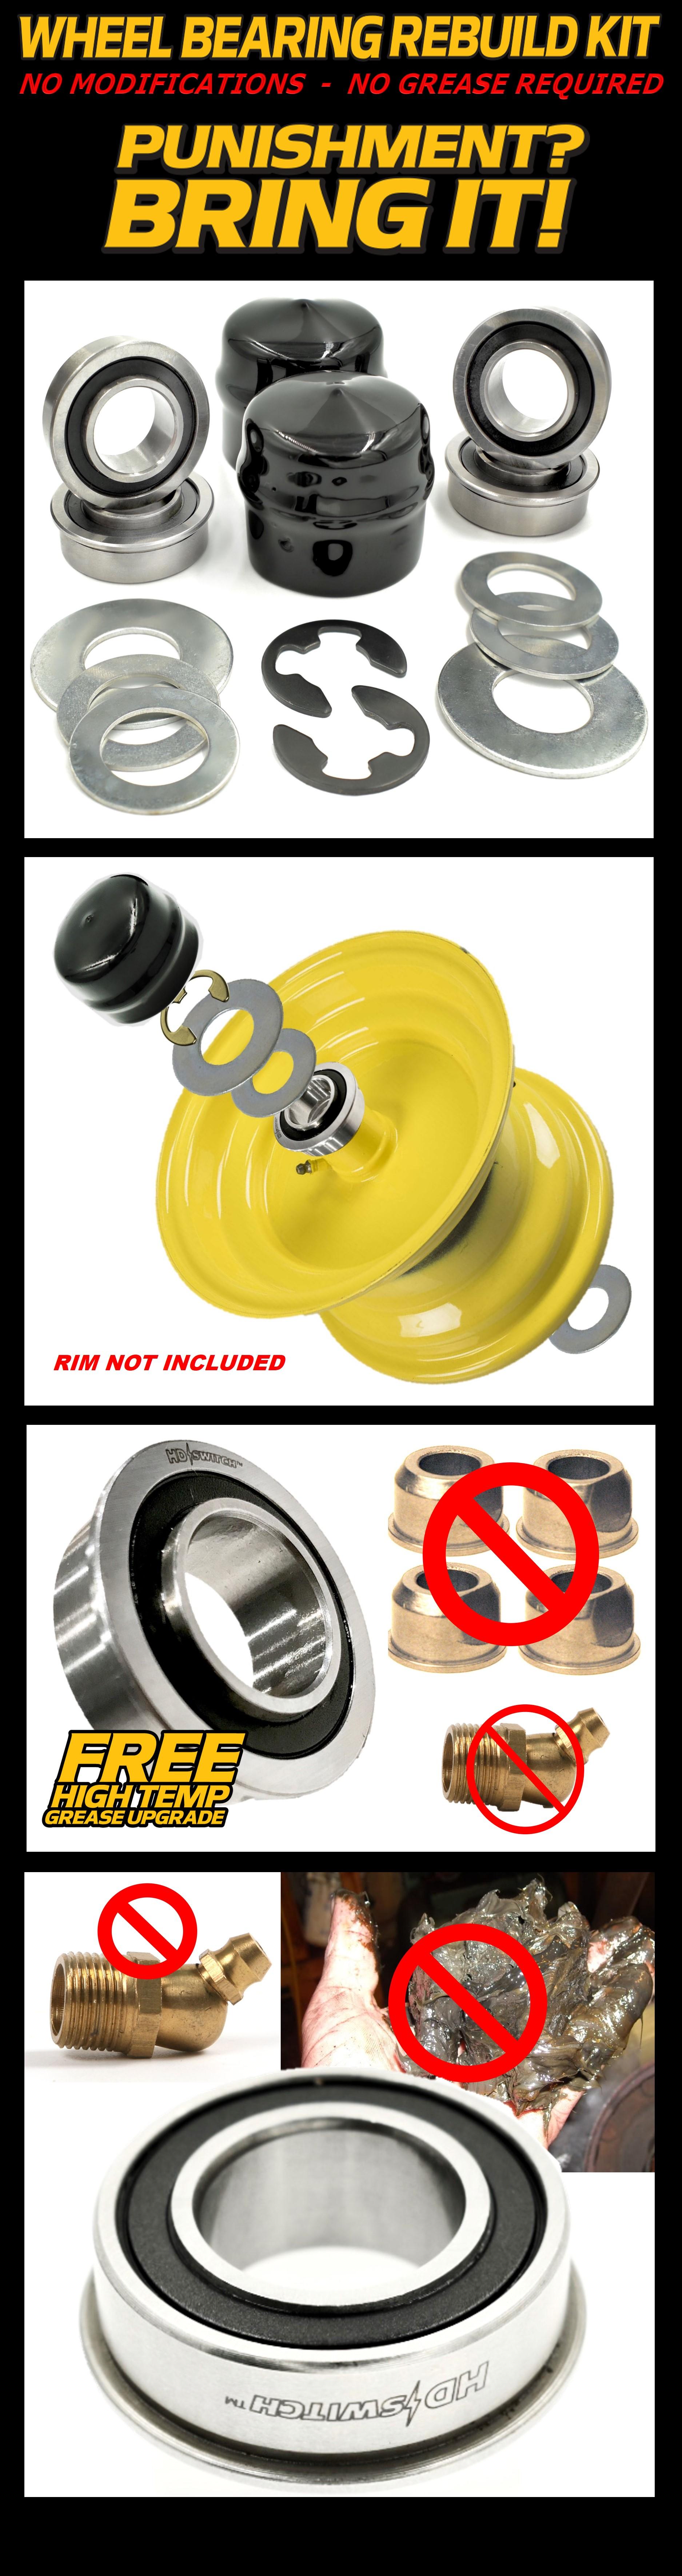 Wheel Bearing Rebuild Kit replaces Deere Sabre Scotts L1742 L2048 L2548 LT160